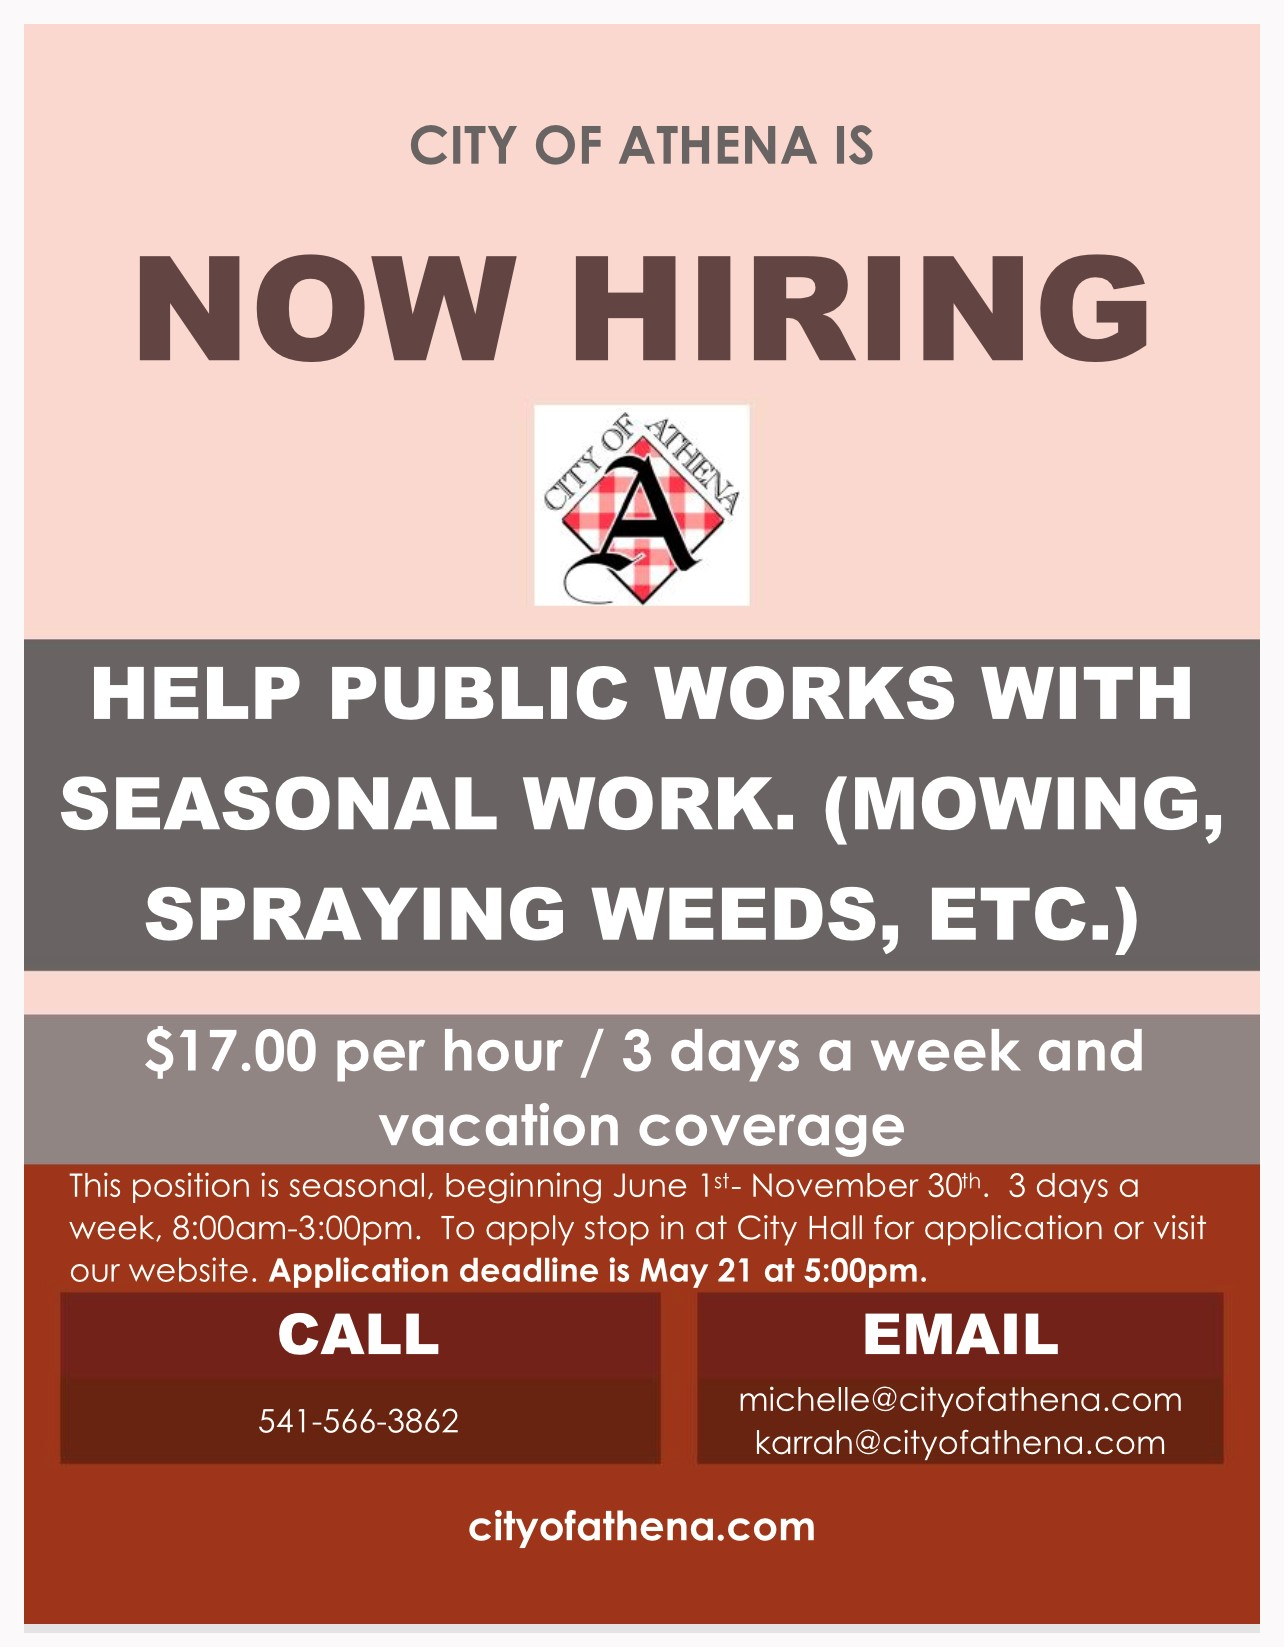 2021 Hiring for Public Work Help